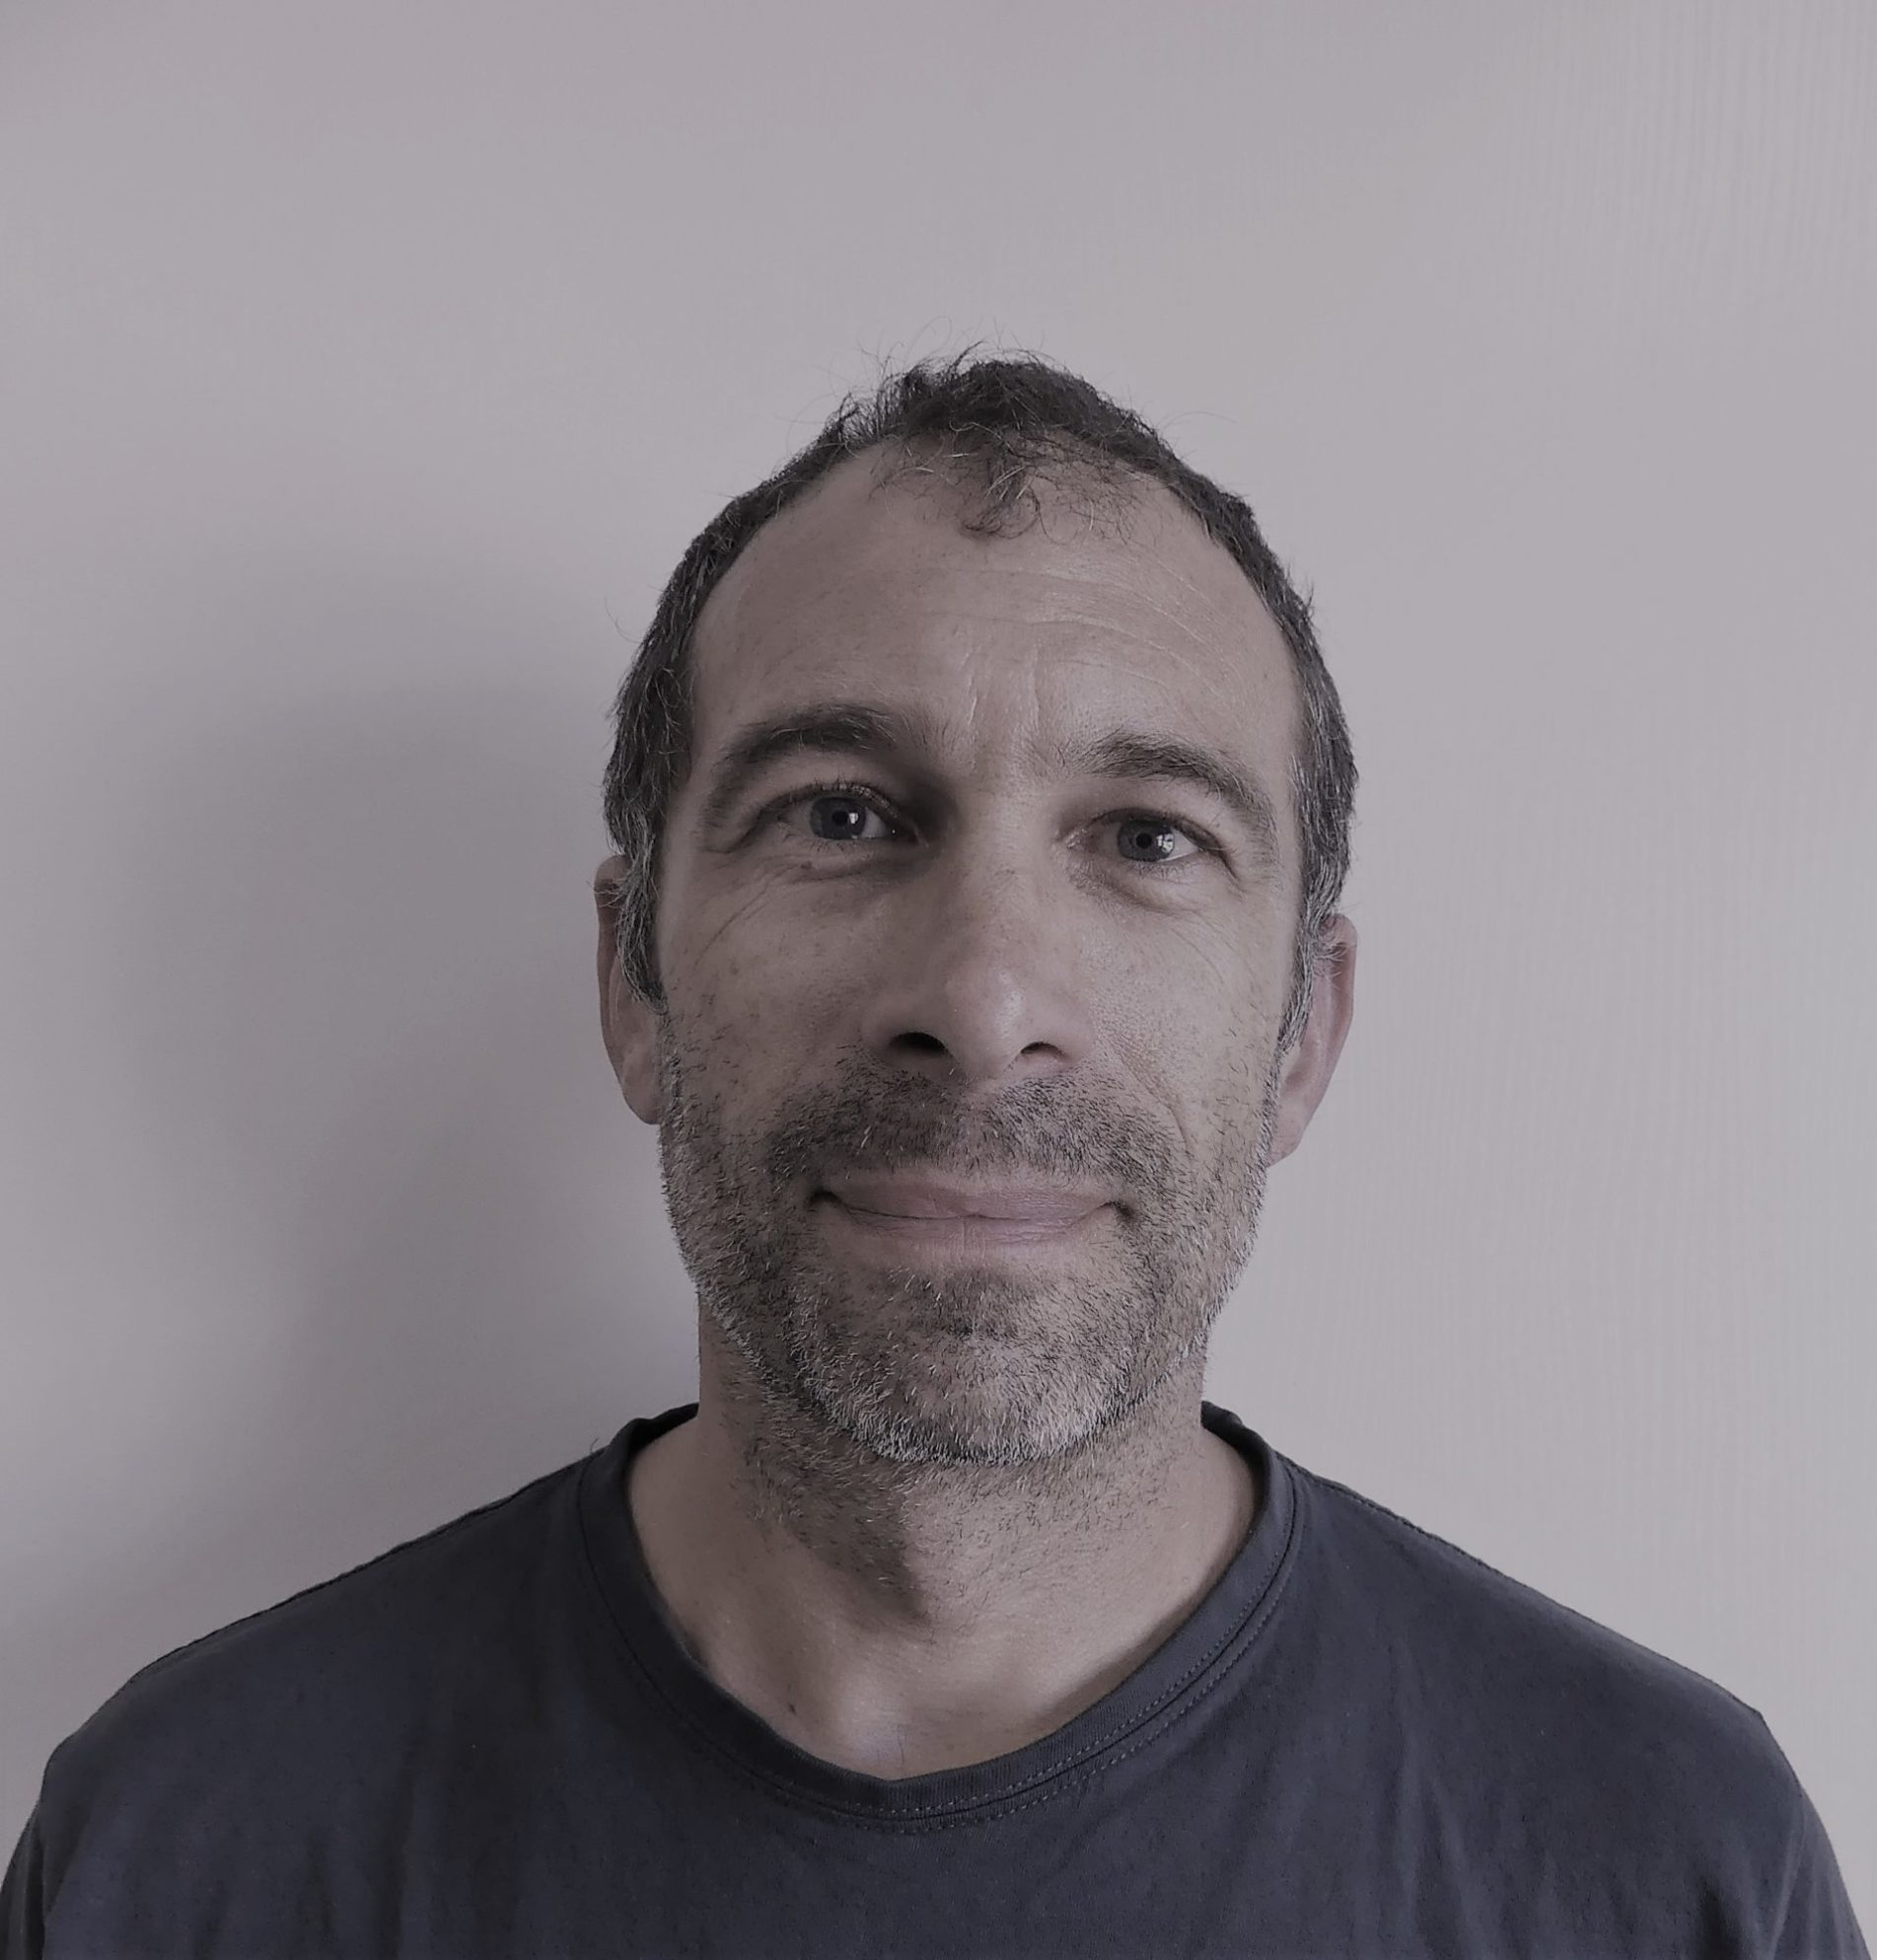 Jean-Daniel Trainini